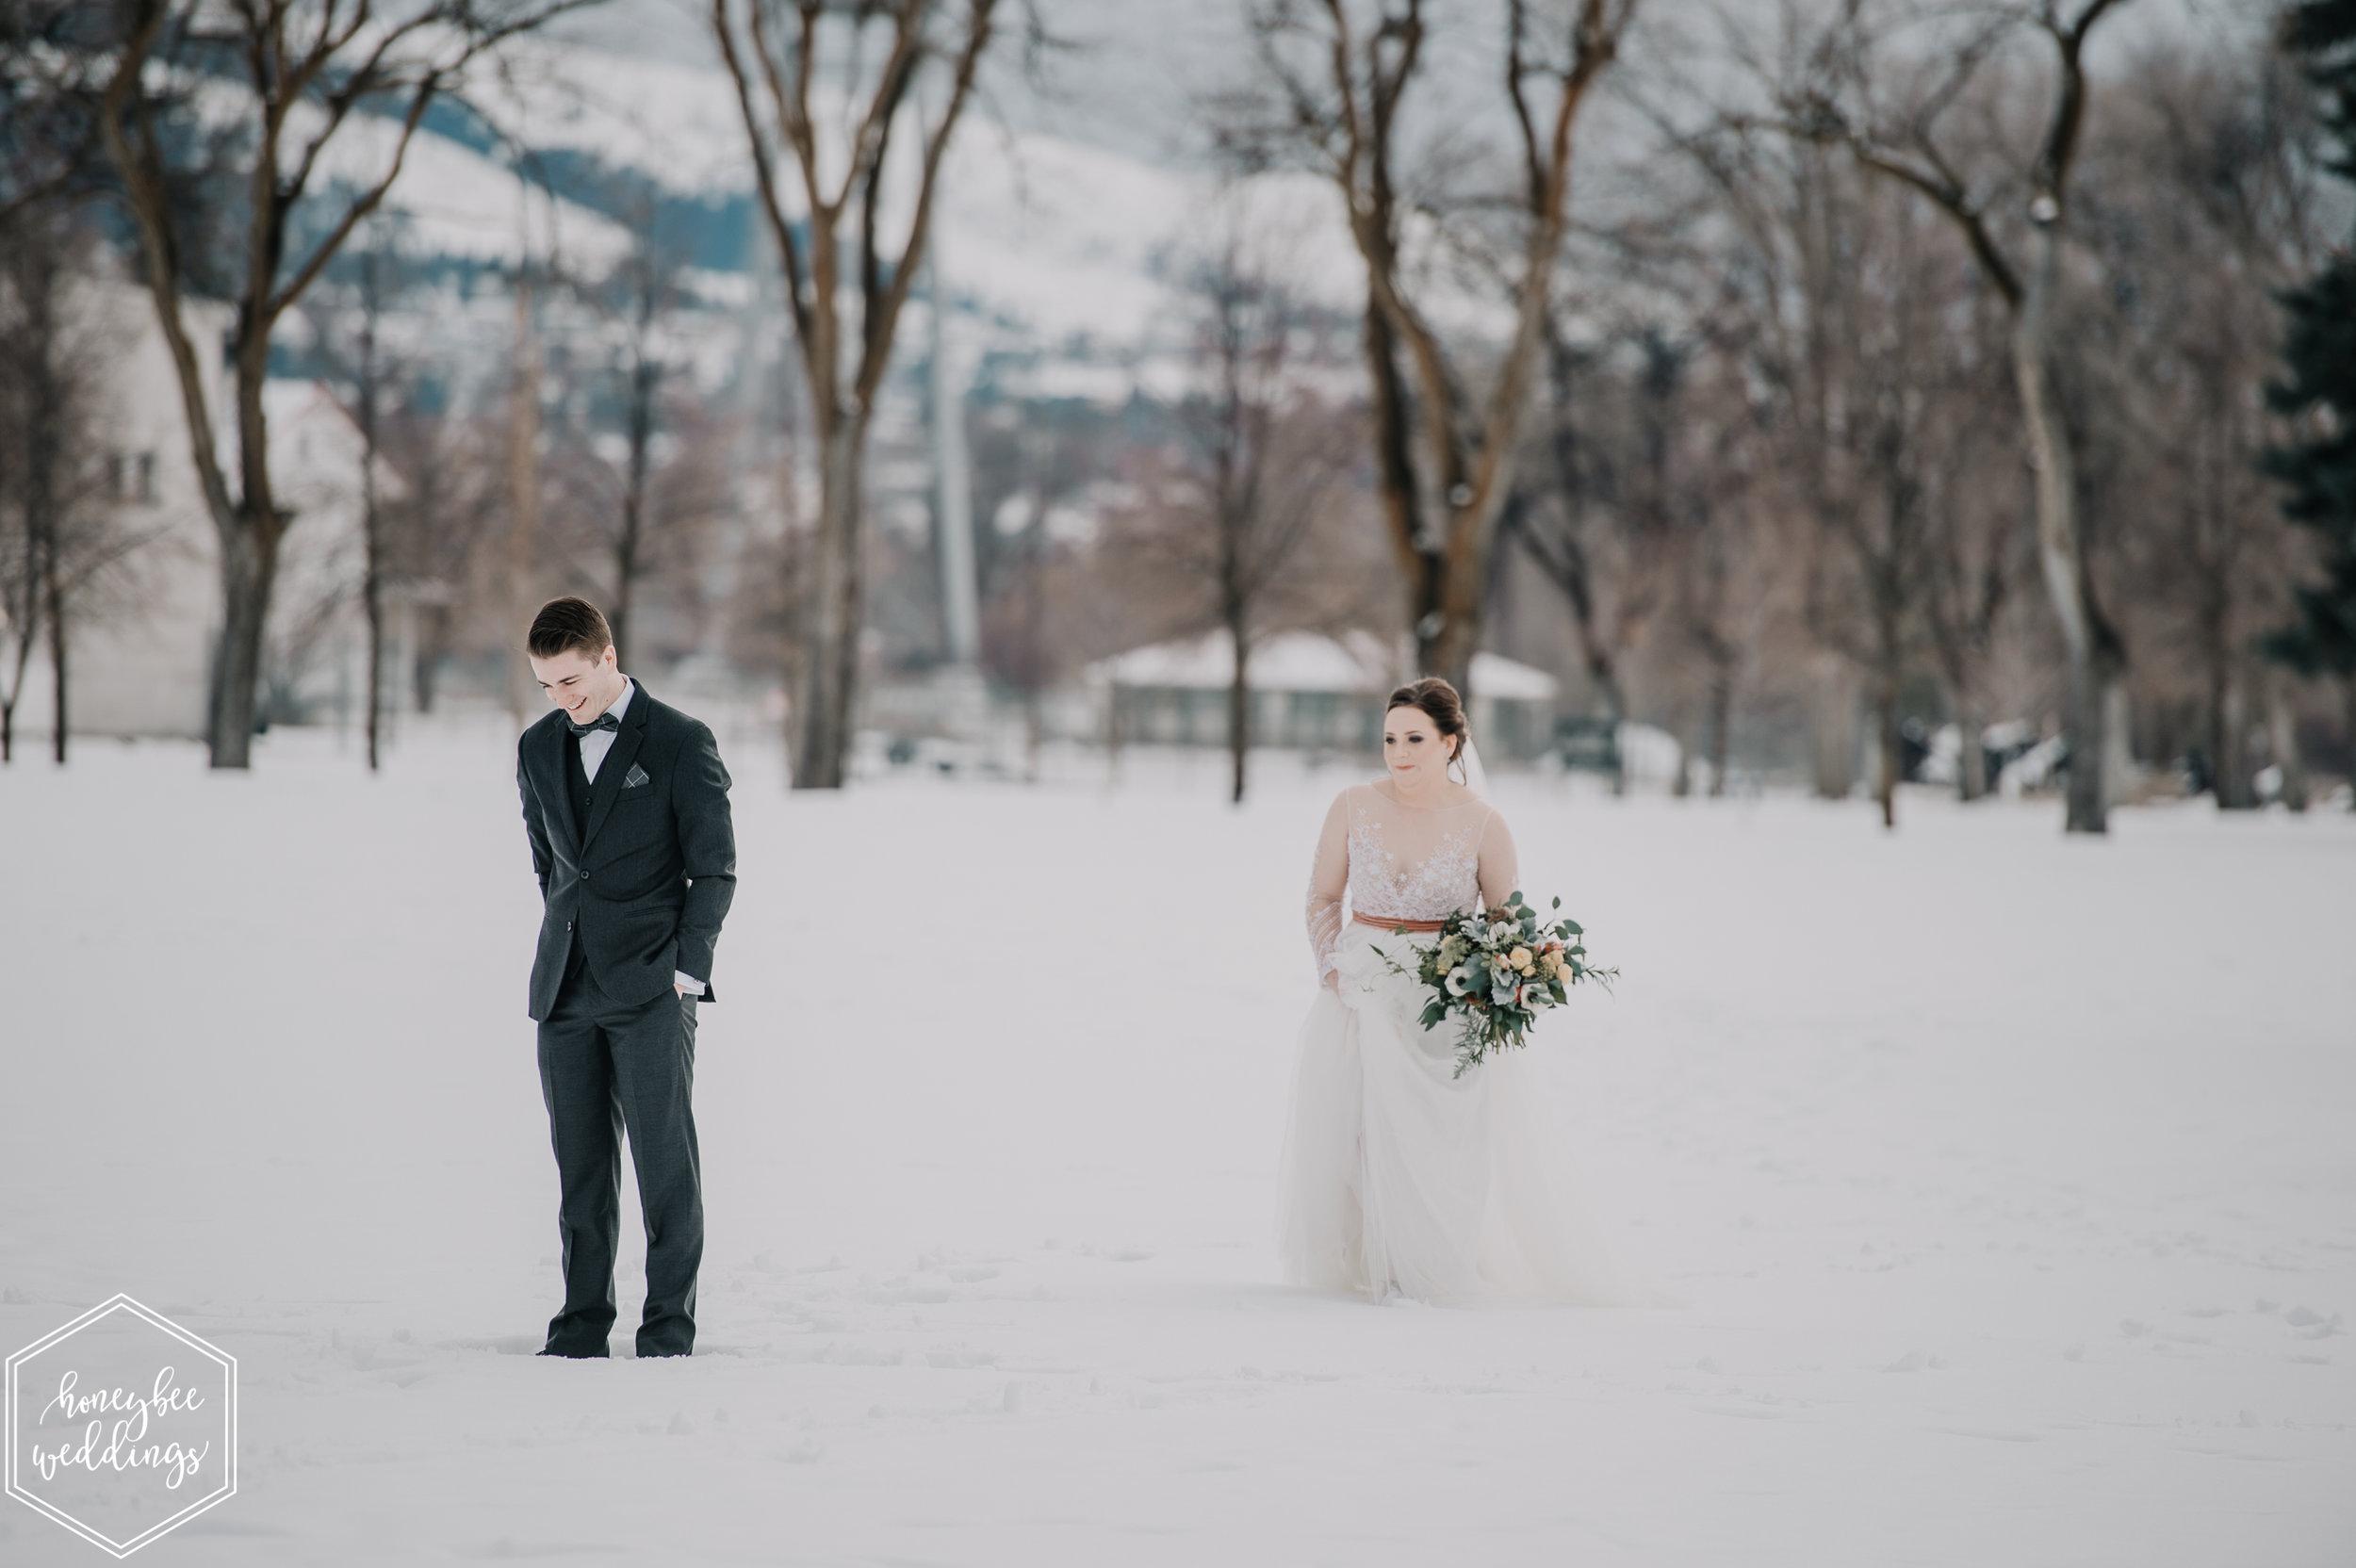 0070Montana Wedding Photographer_Montana winter wedding_Wedding at Fort Missoula_Meri & Carter_January 19, 2019-164.jpg